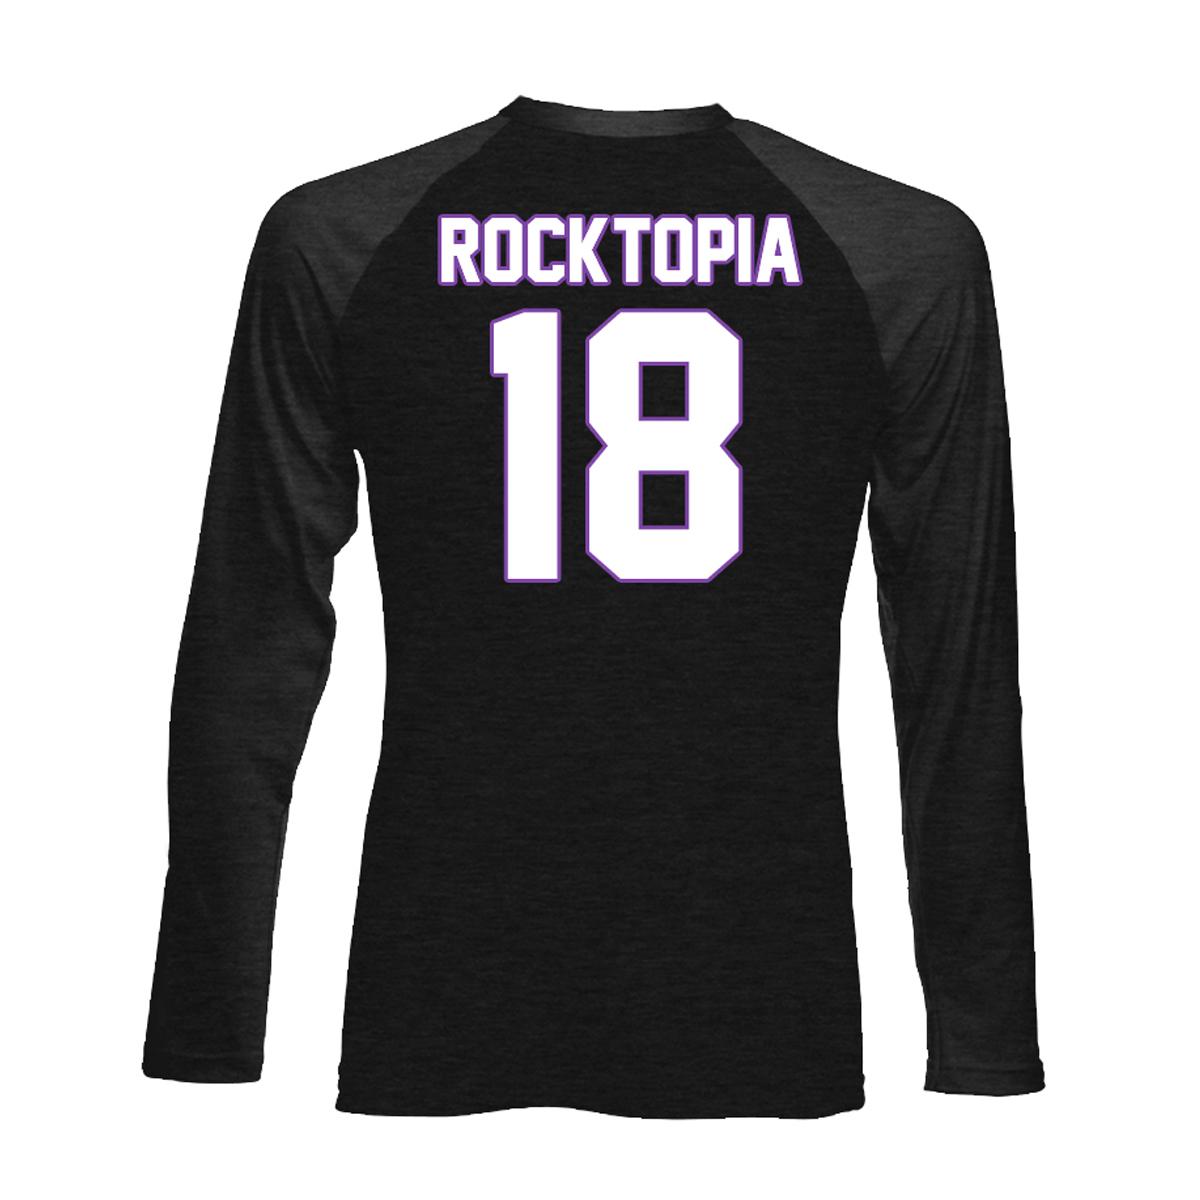 Rocktopia Logo Black/Charcoal Vintage Raglan